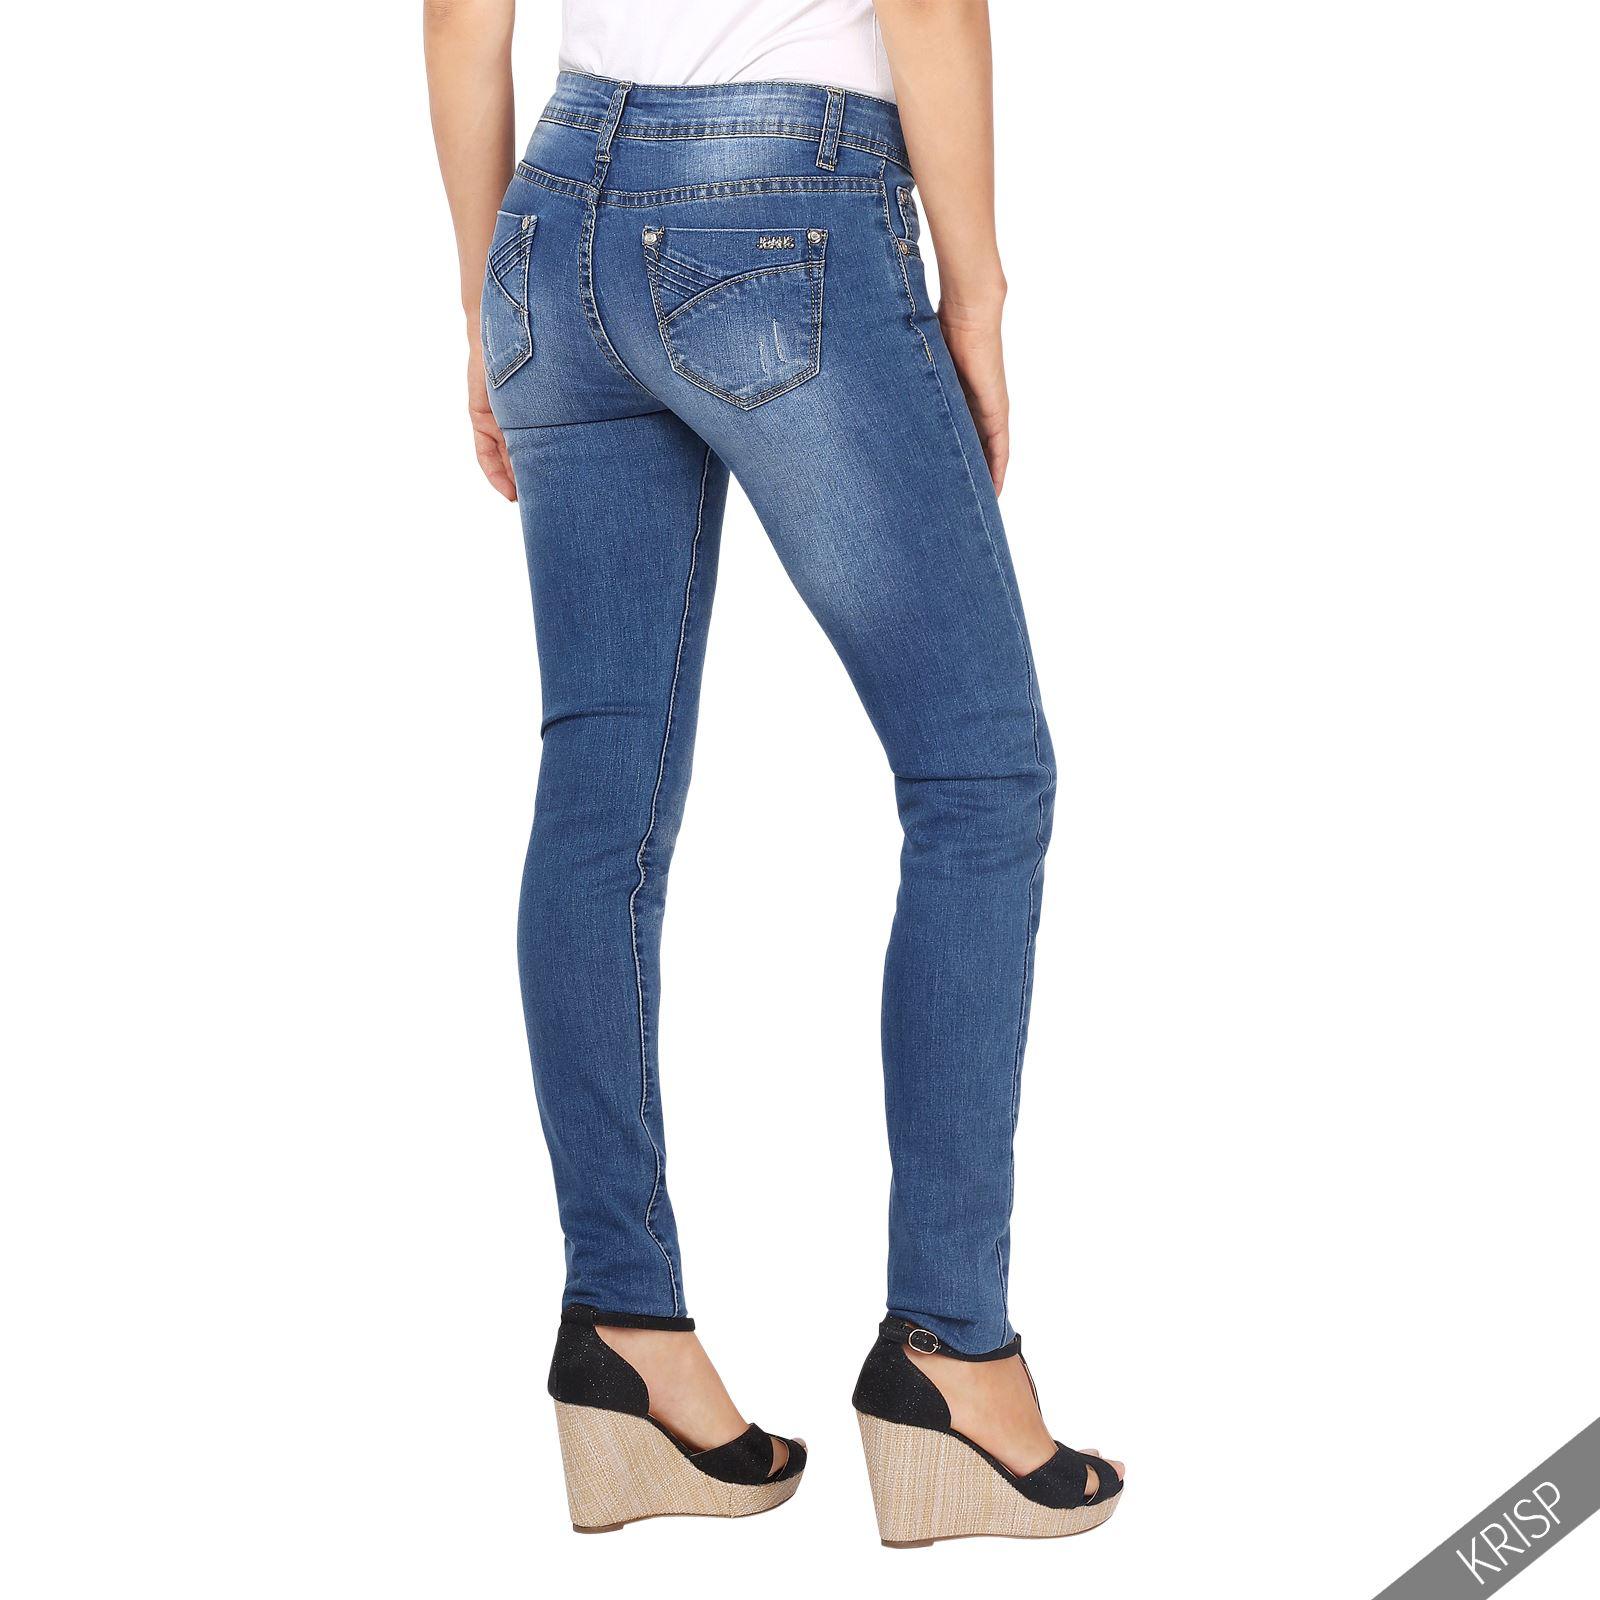 damen frauen helle slim fit jeans mit waschung. Black Bedroom Furniture Sets. Home Design Ideas